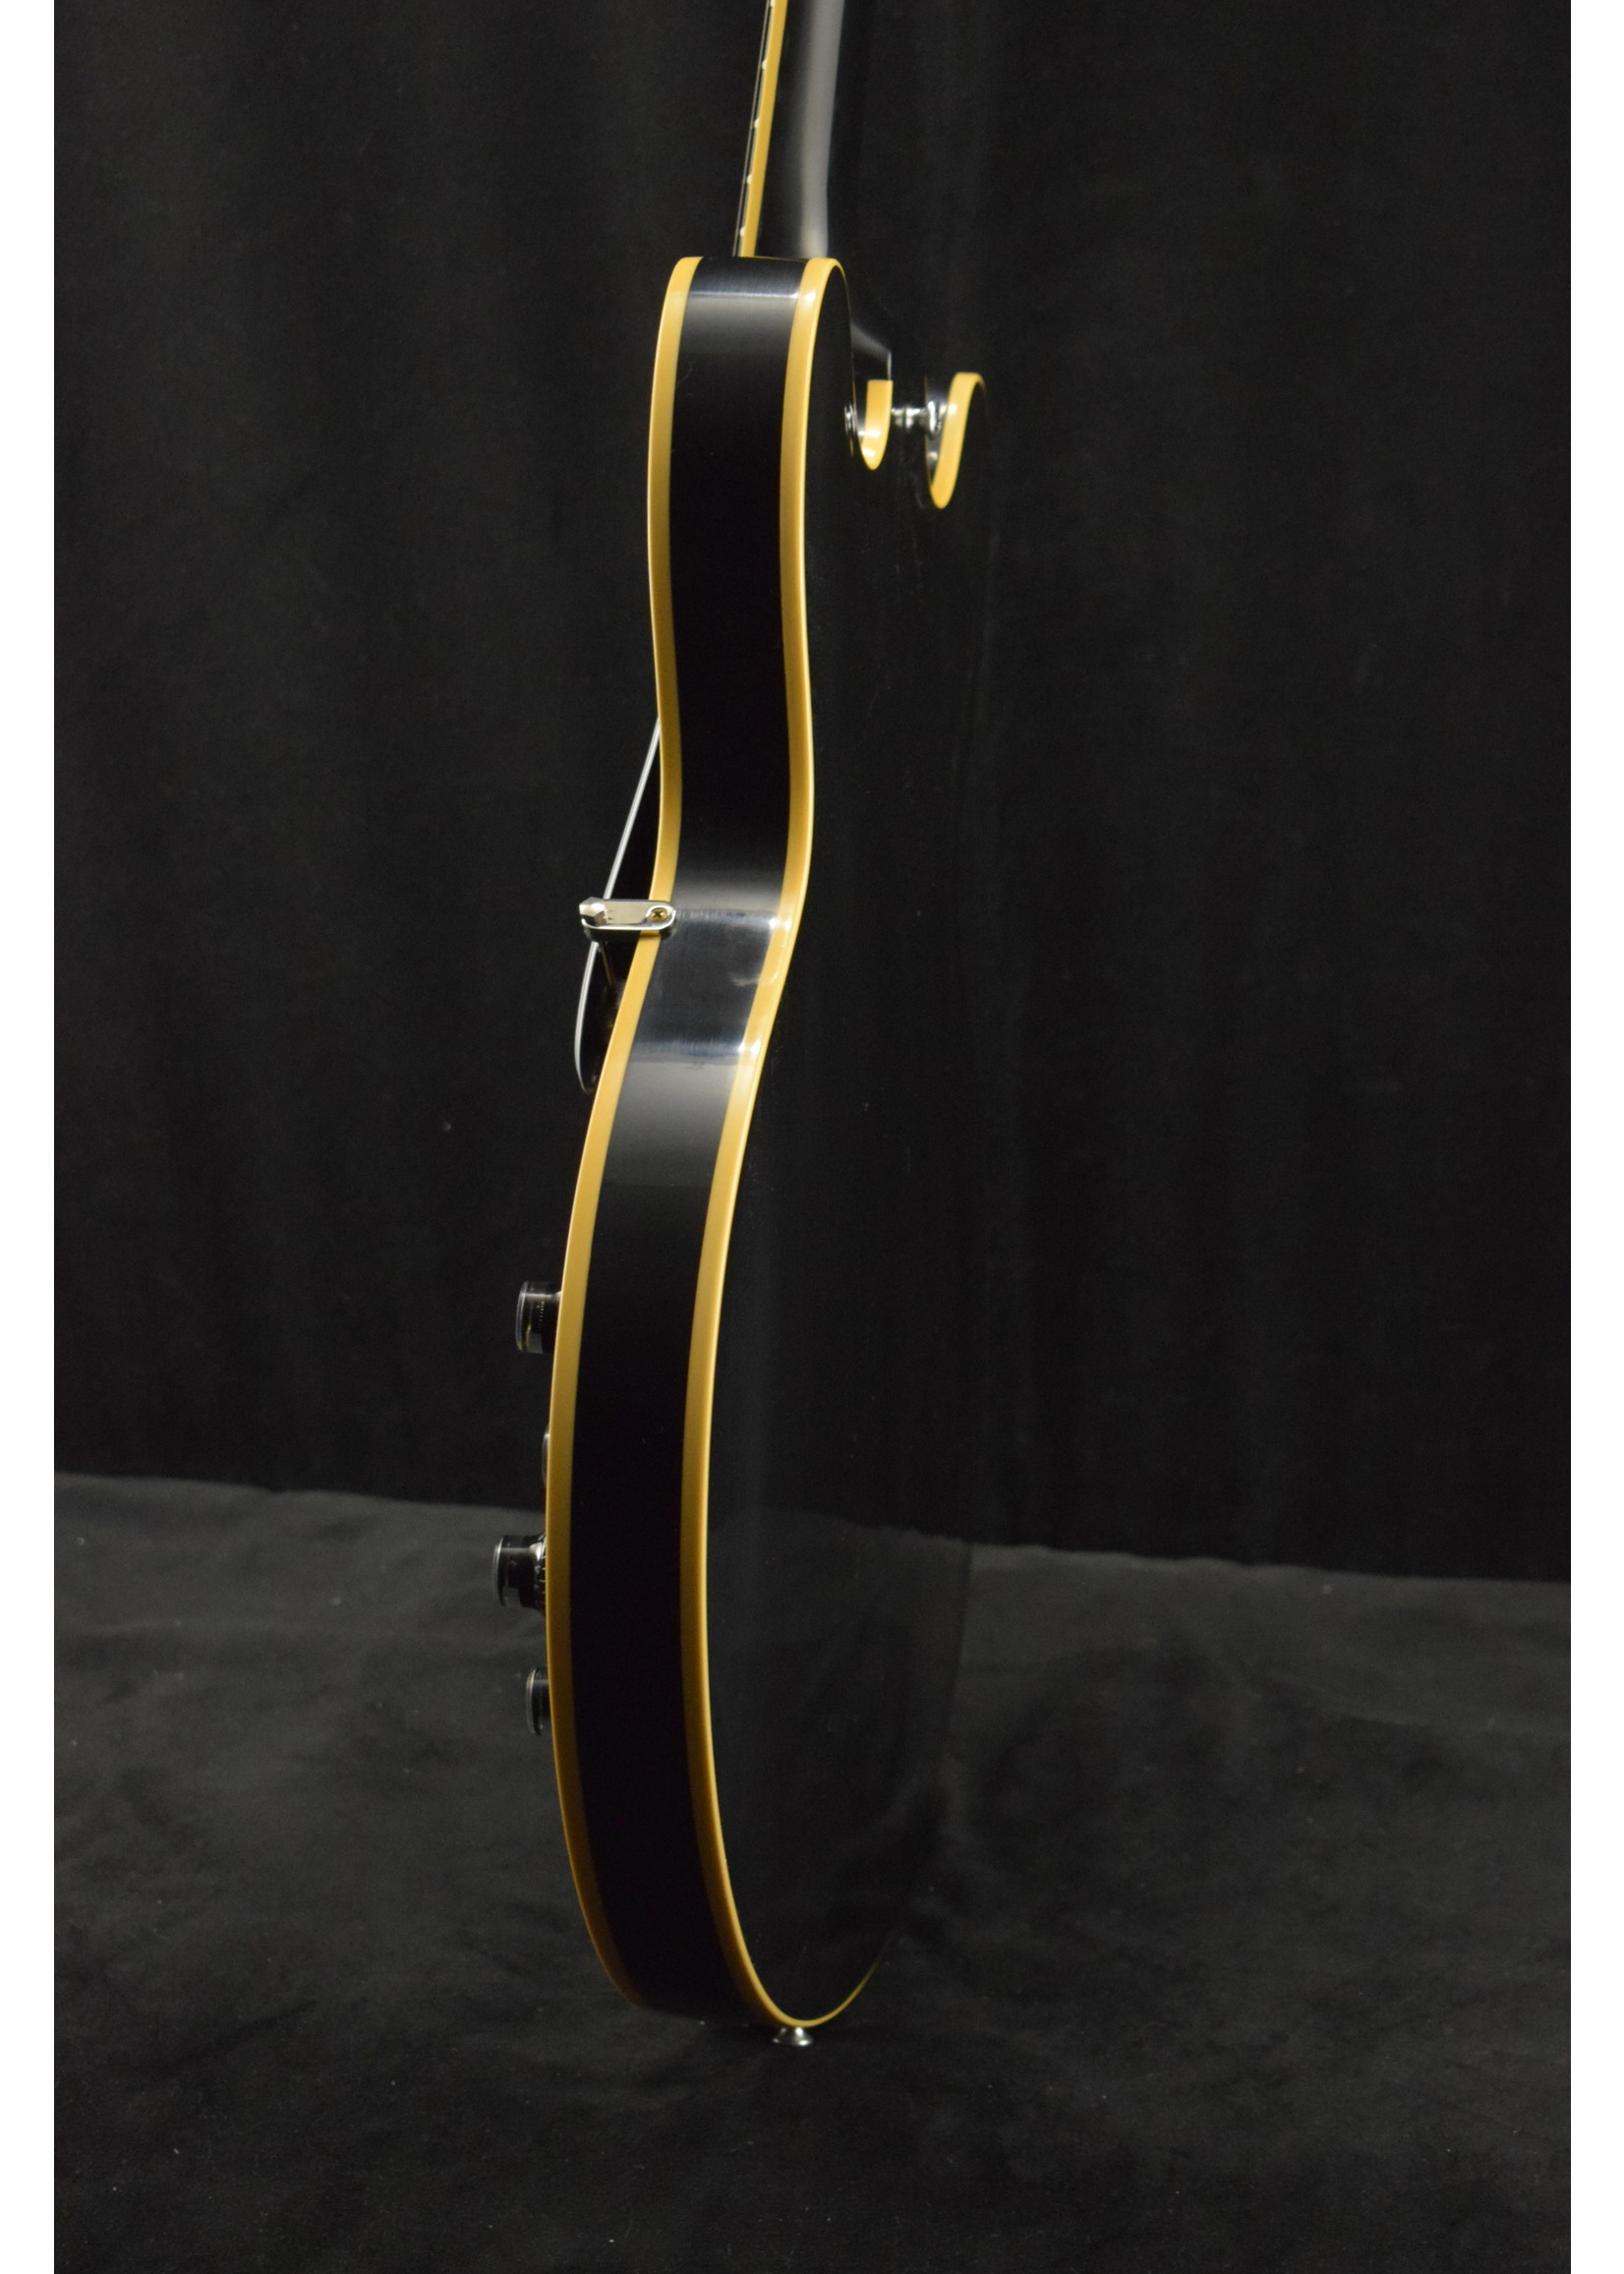 Gibson Gibson 1964 Trini Lopez ES-335 Standard Reissue Ebony